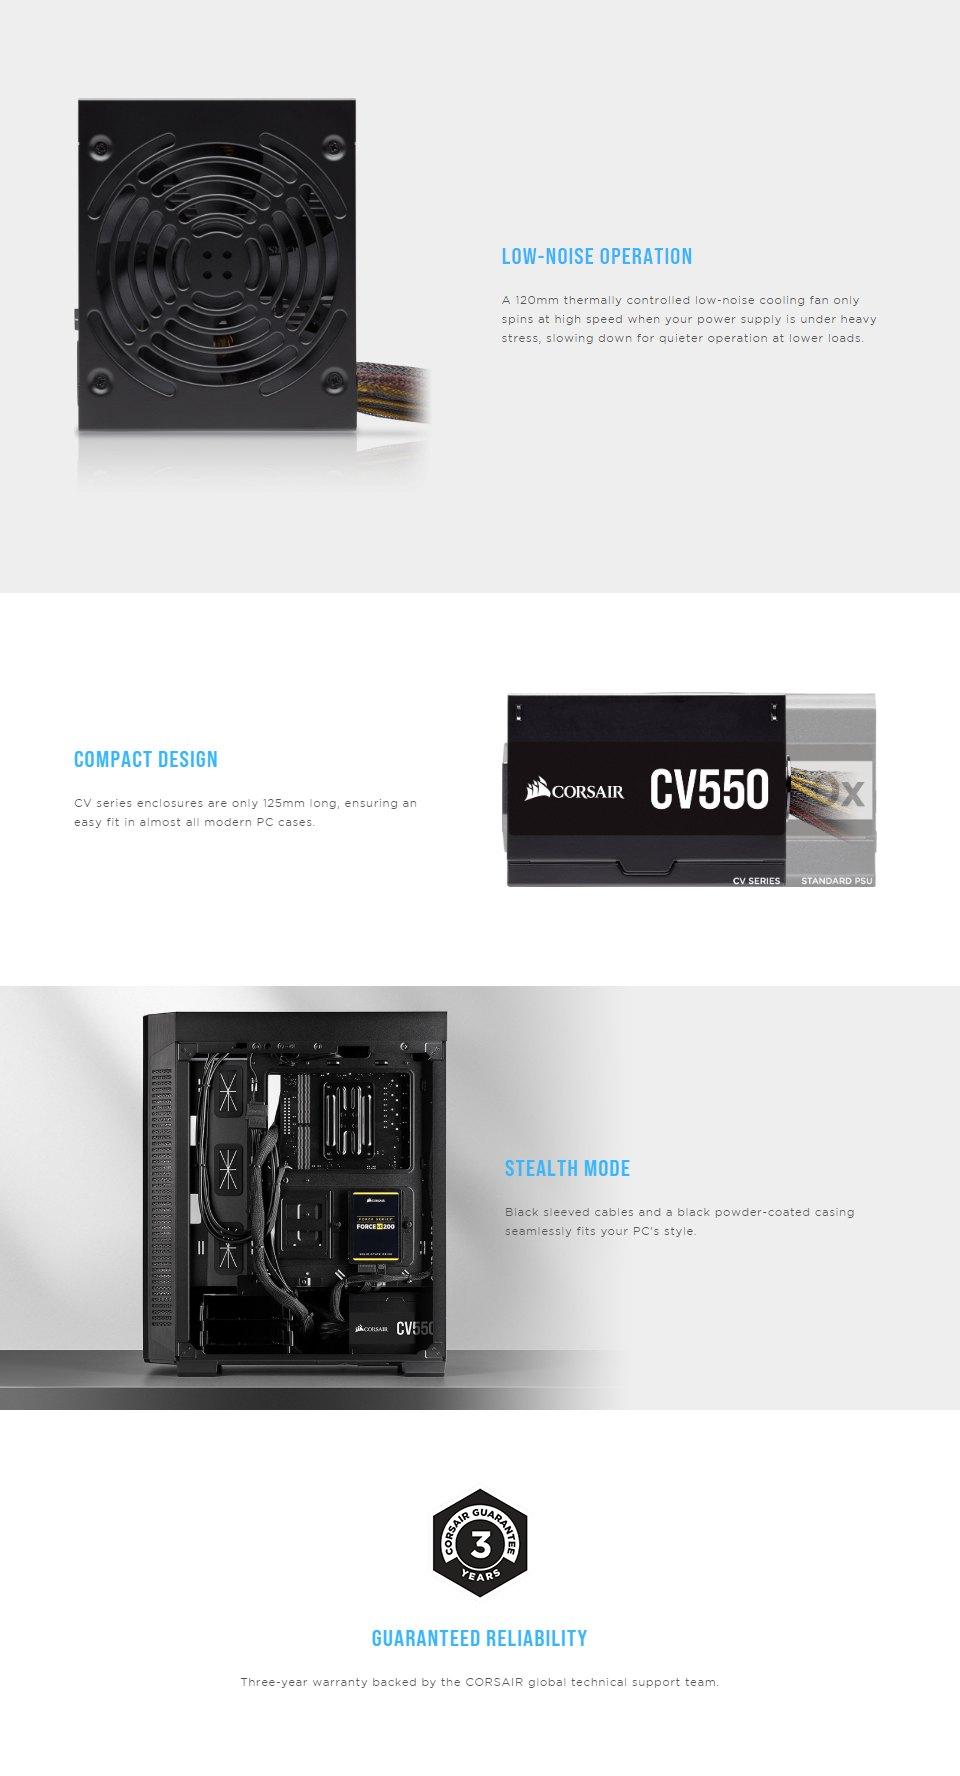 Corsair CV550 550W Power Supply features 2